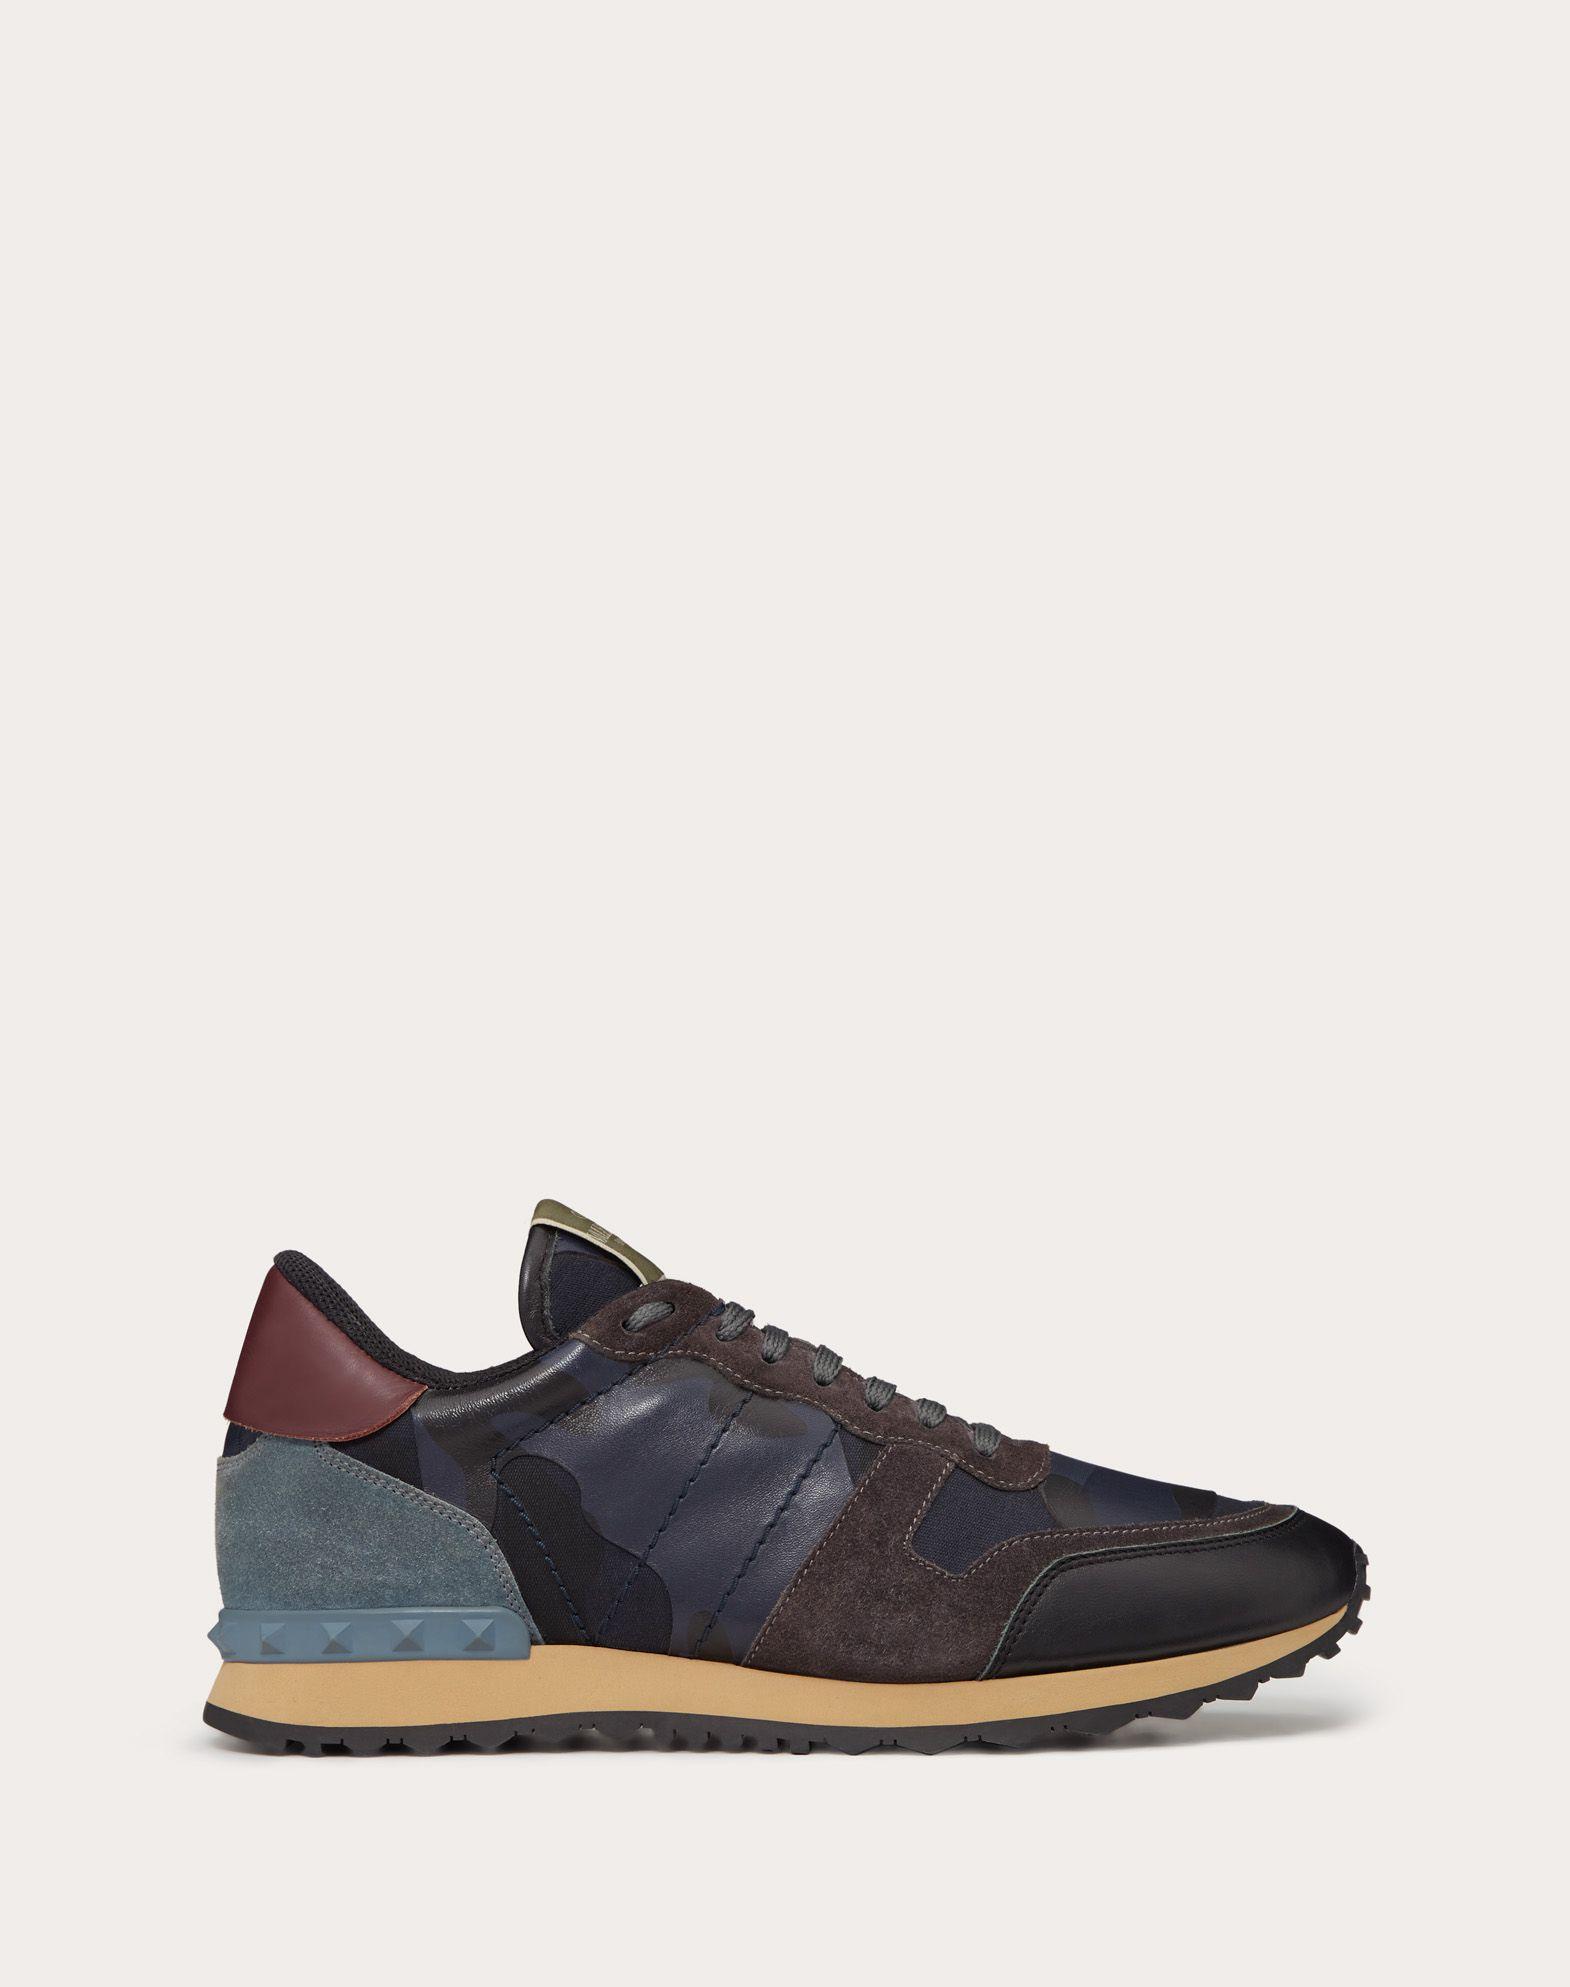 VALENTINO GARAVANI UOMO Camouflage Rockrunner Sneaker LOW-TOP SNEAKERS U f